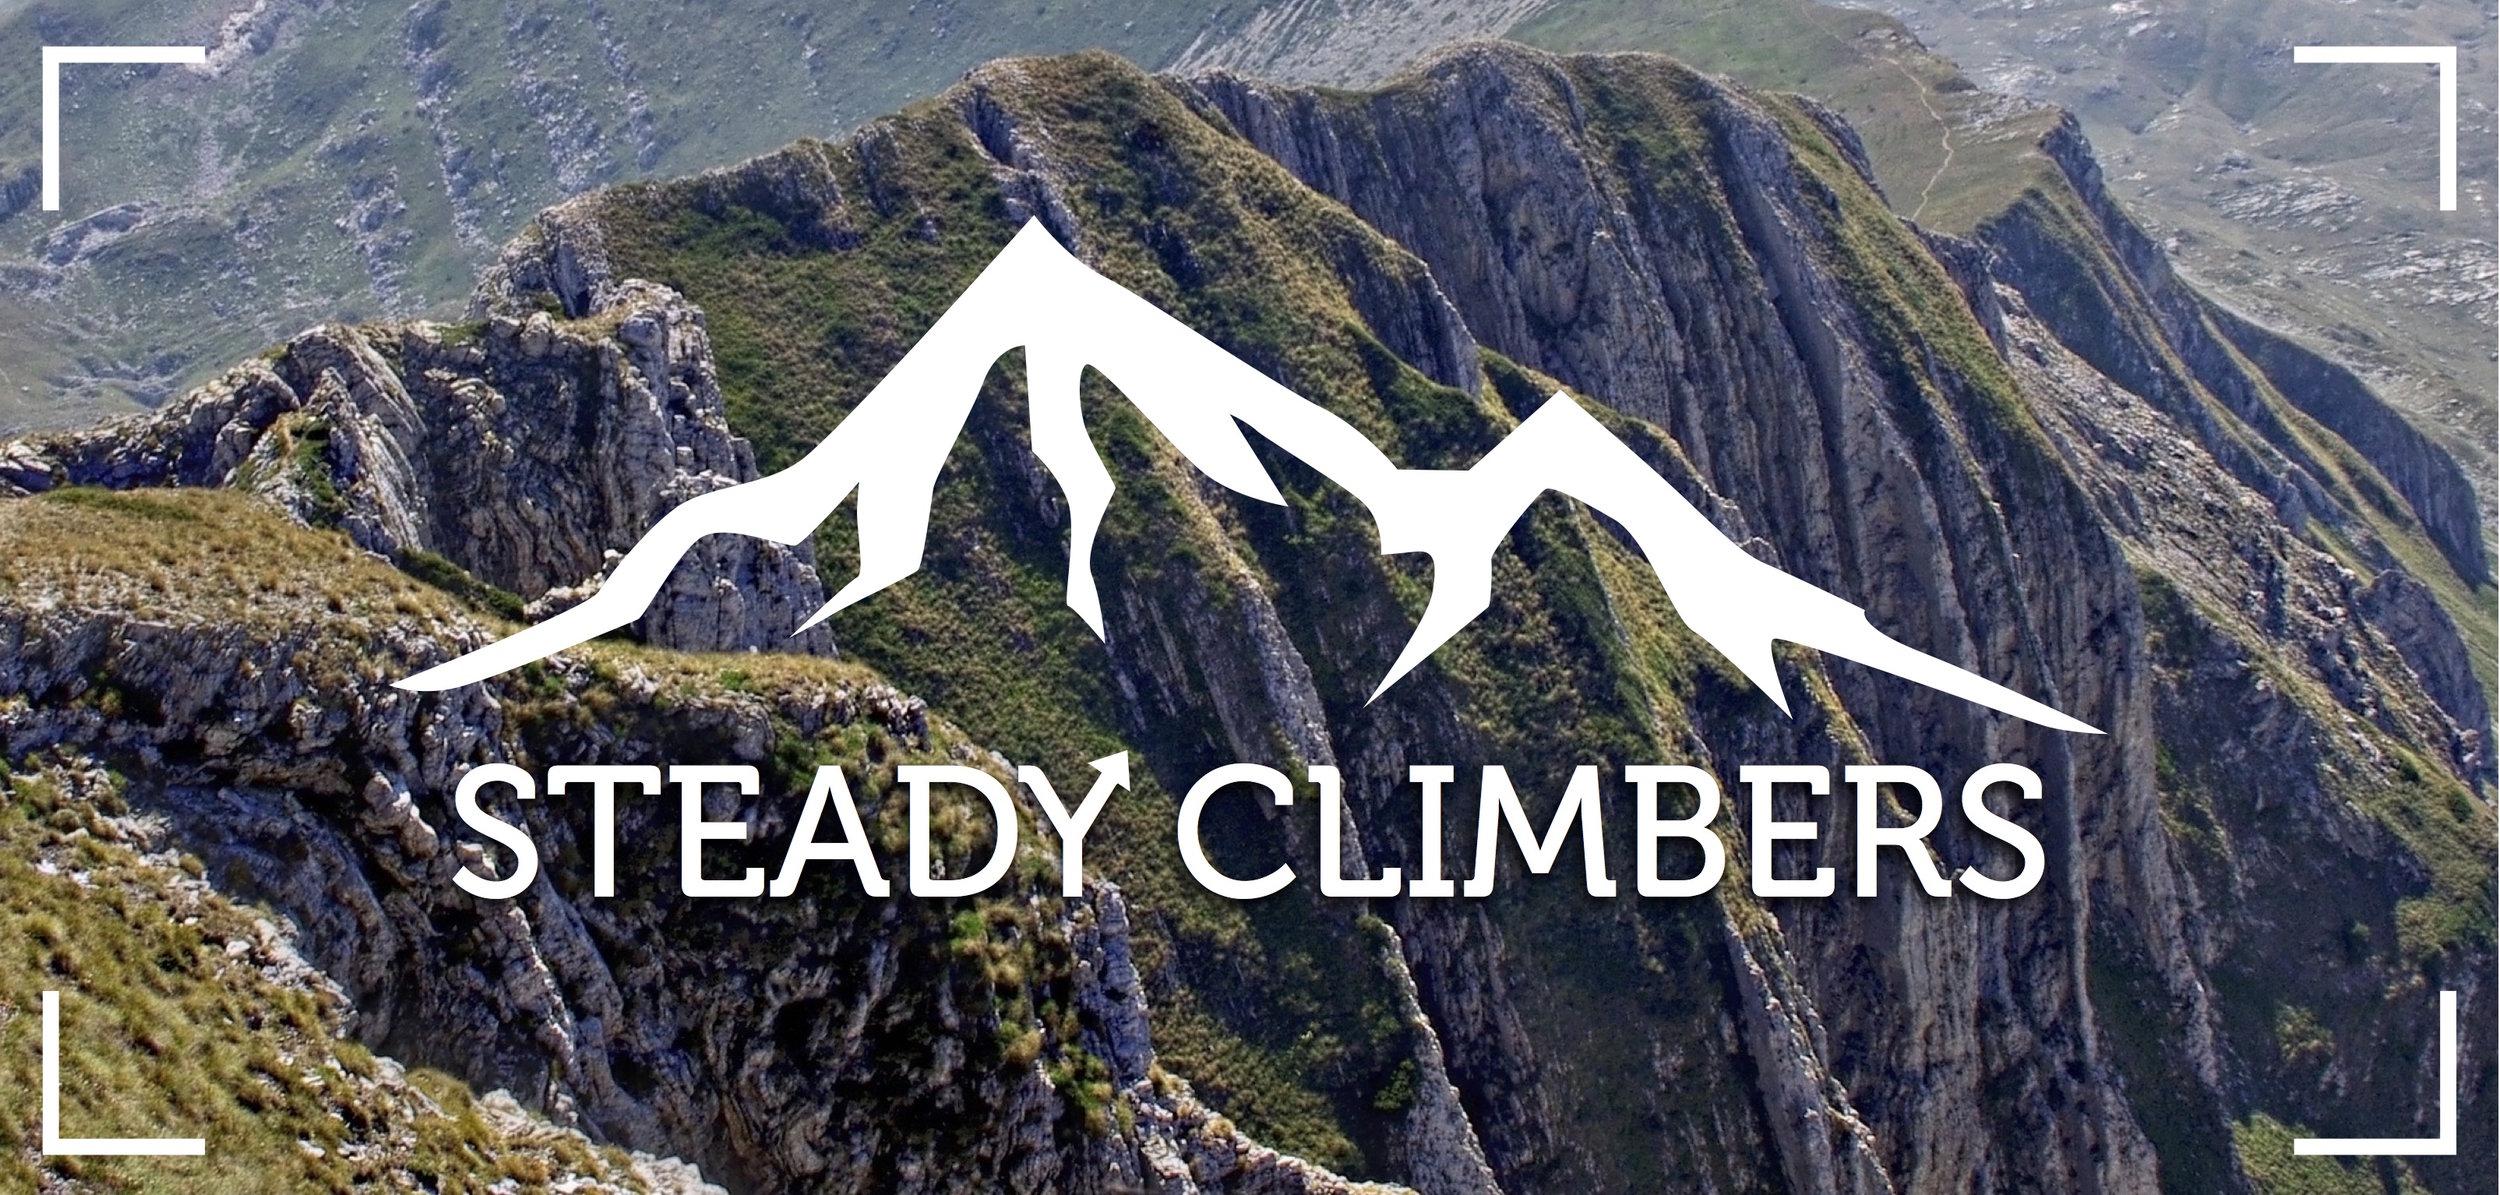 Steady Climbers